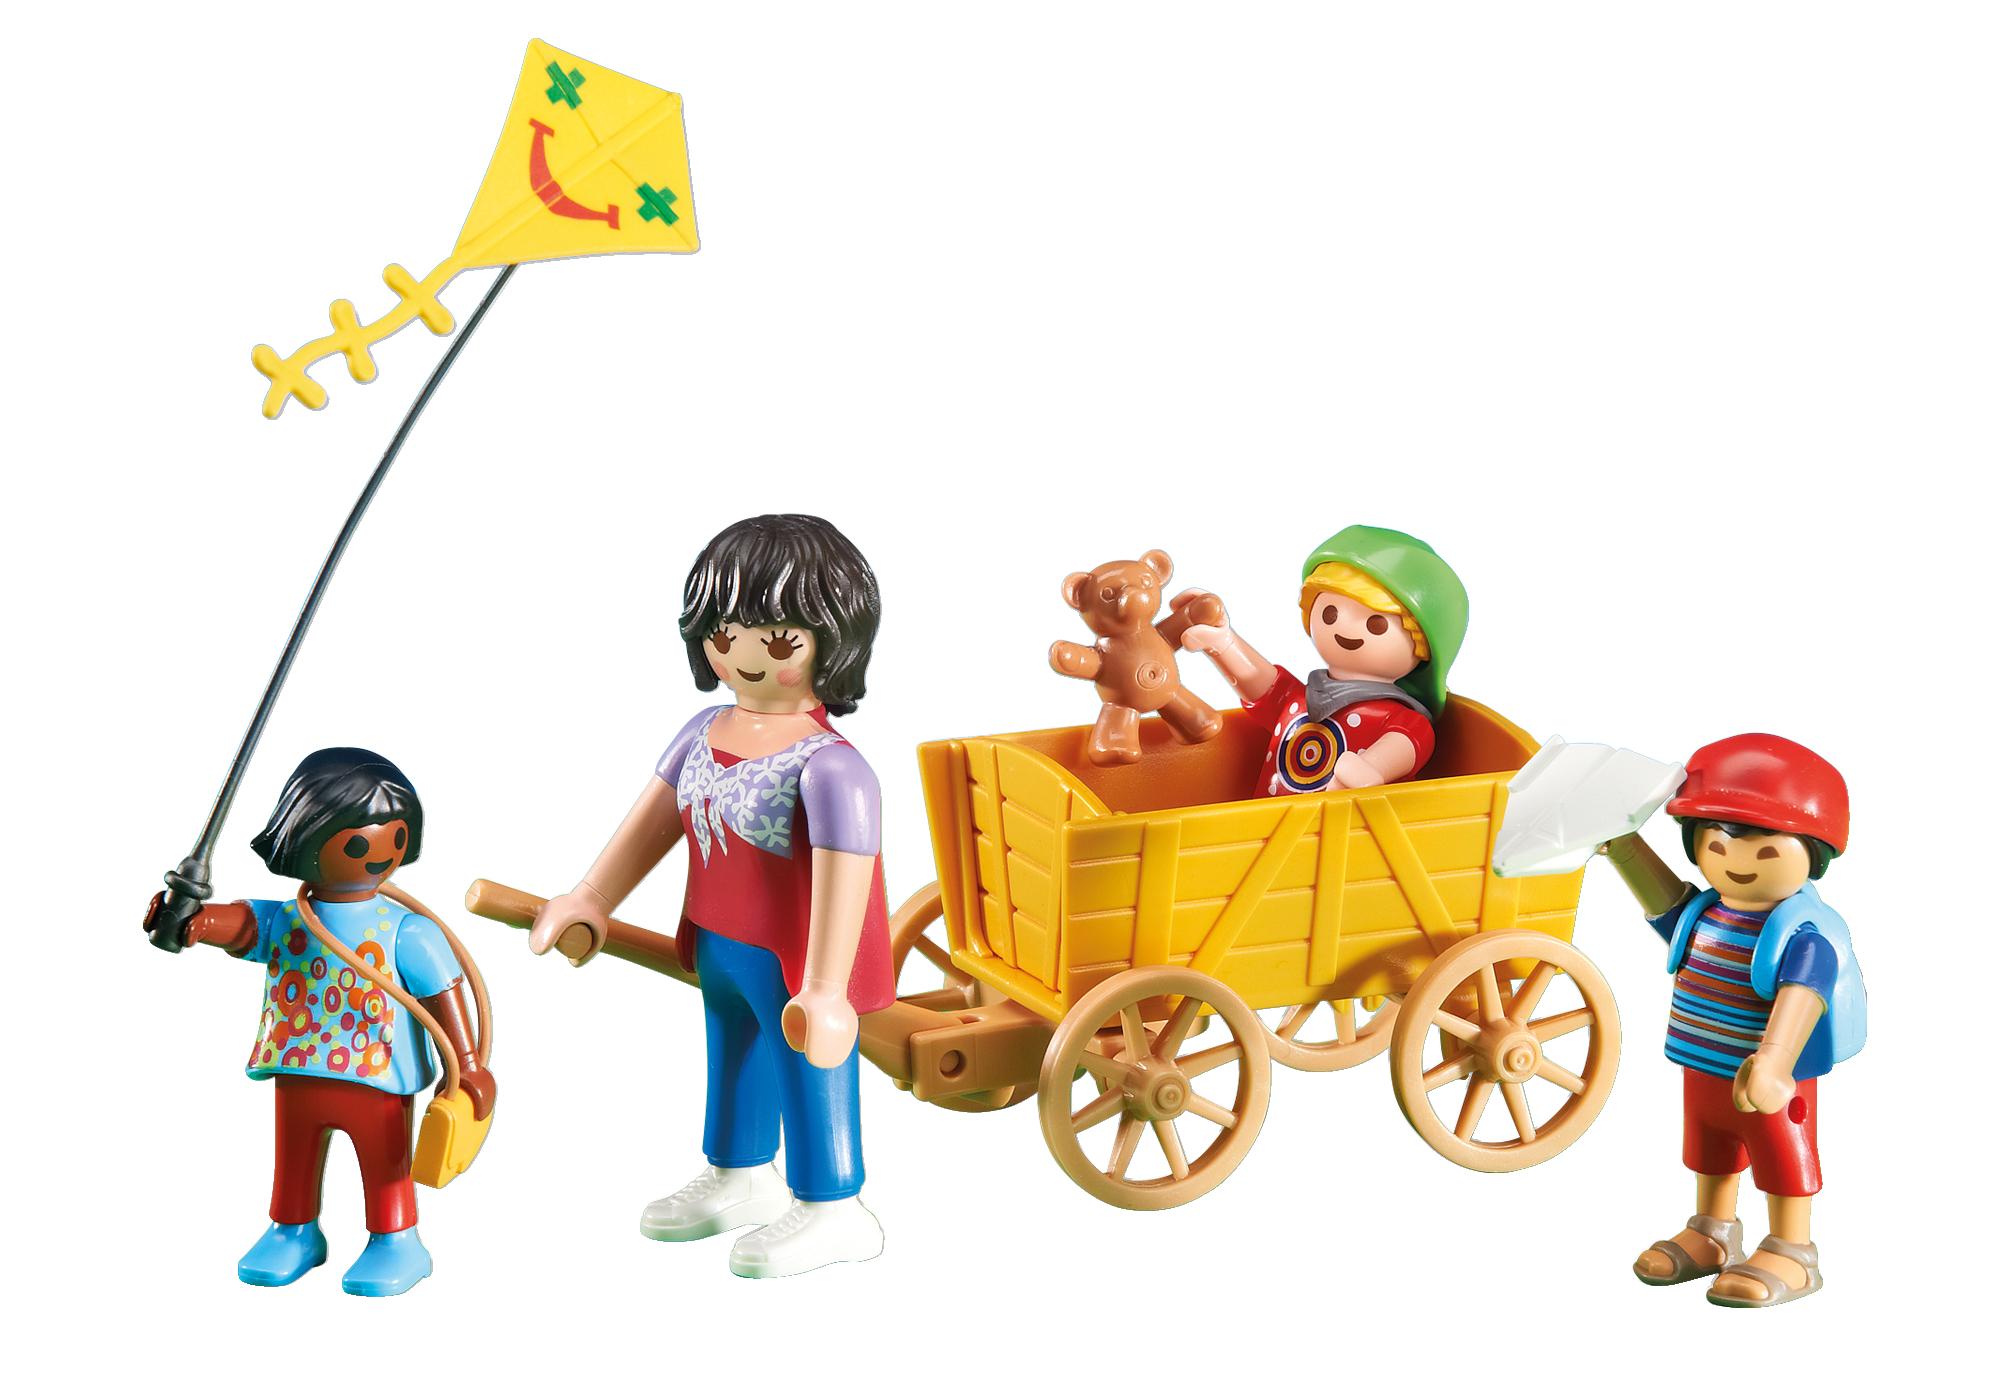 http://media.playmobil.com/i/playmobil/6439_product_detail/Erzieherin mit Bollerwagen